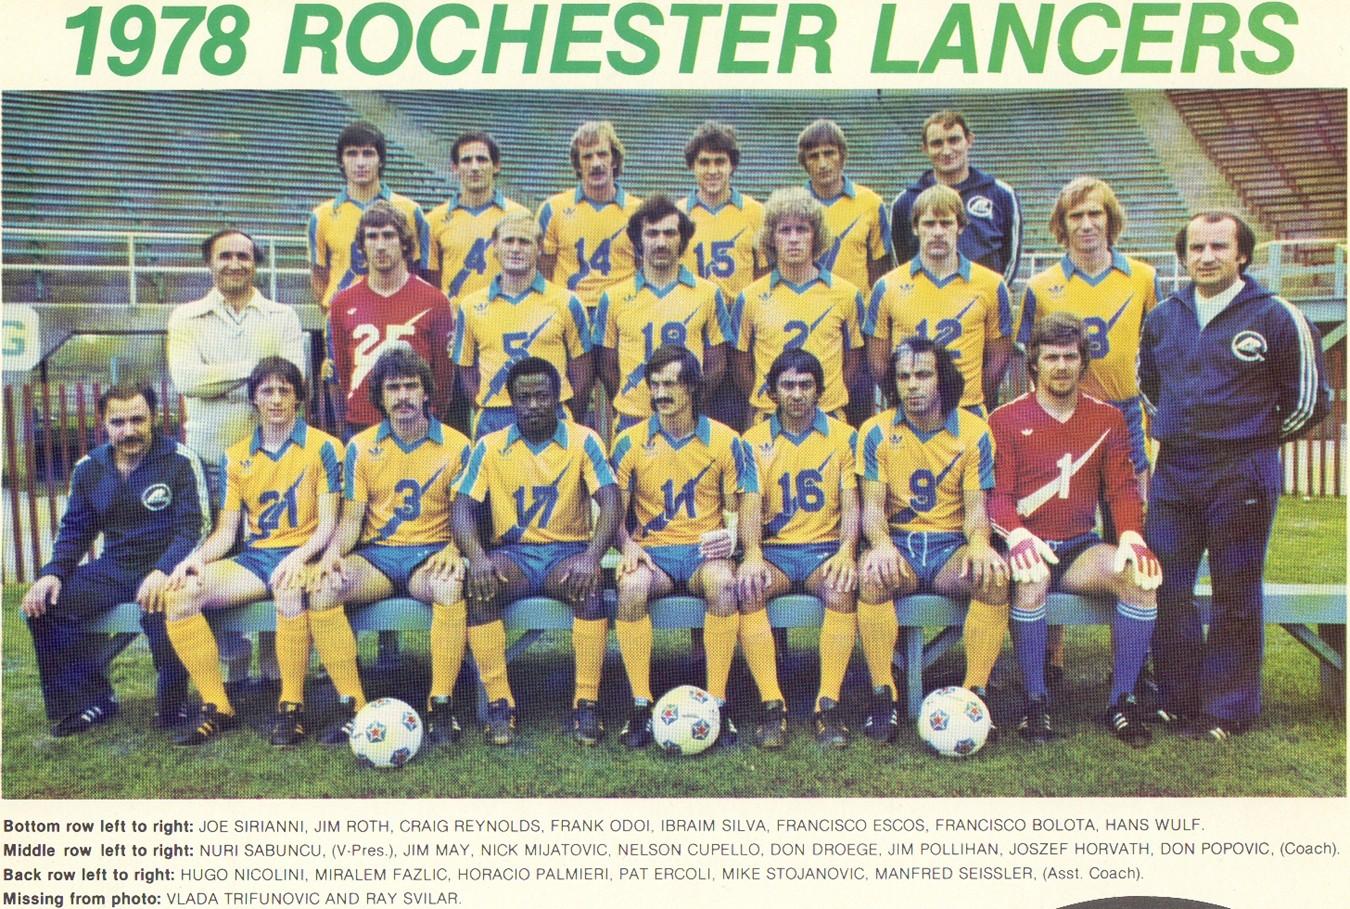 Lancers 78 Home Team.jpg